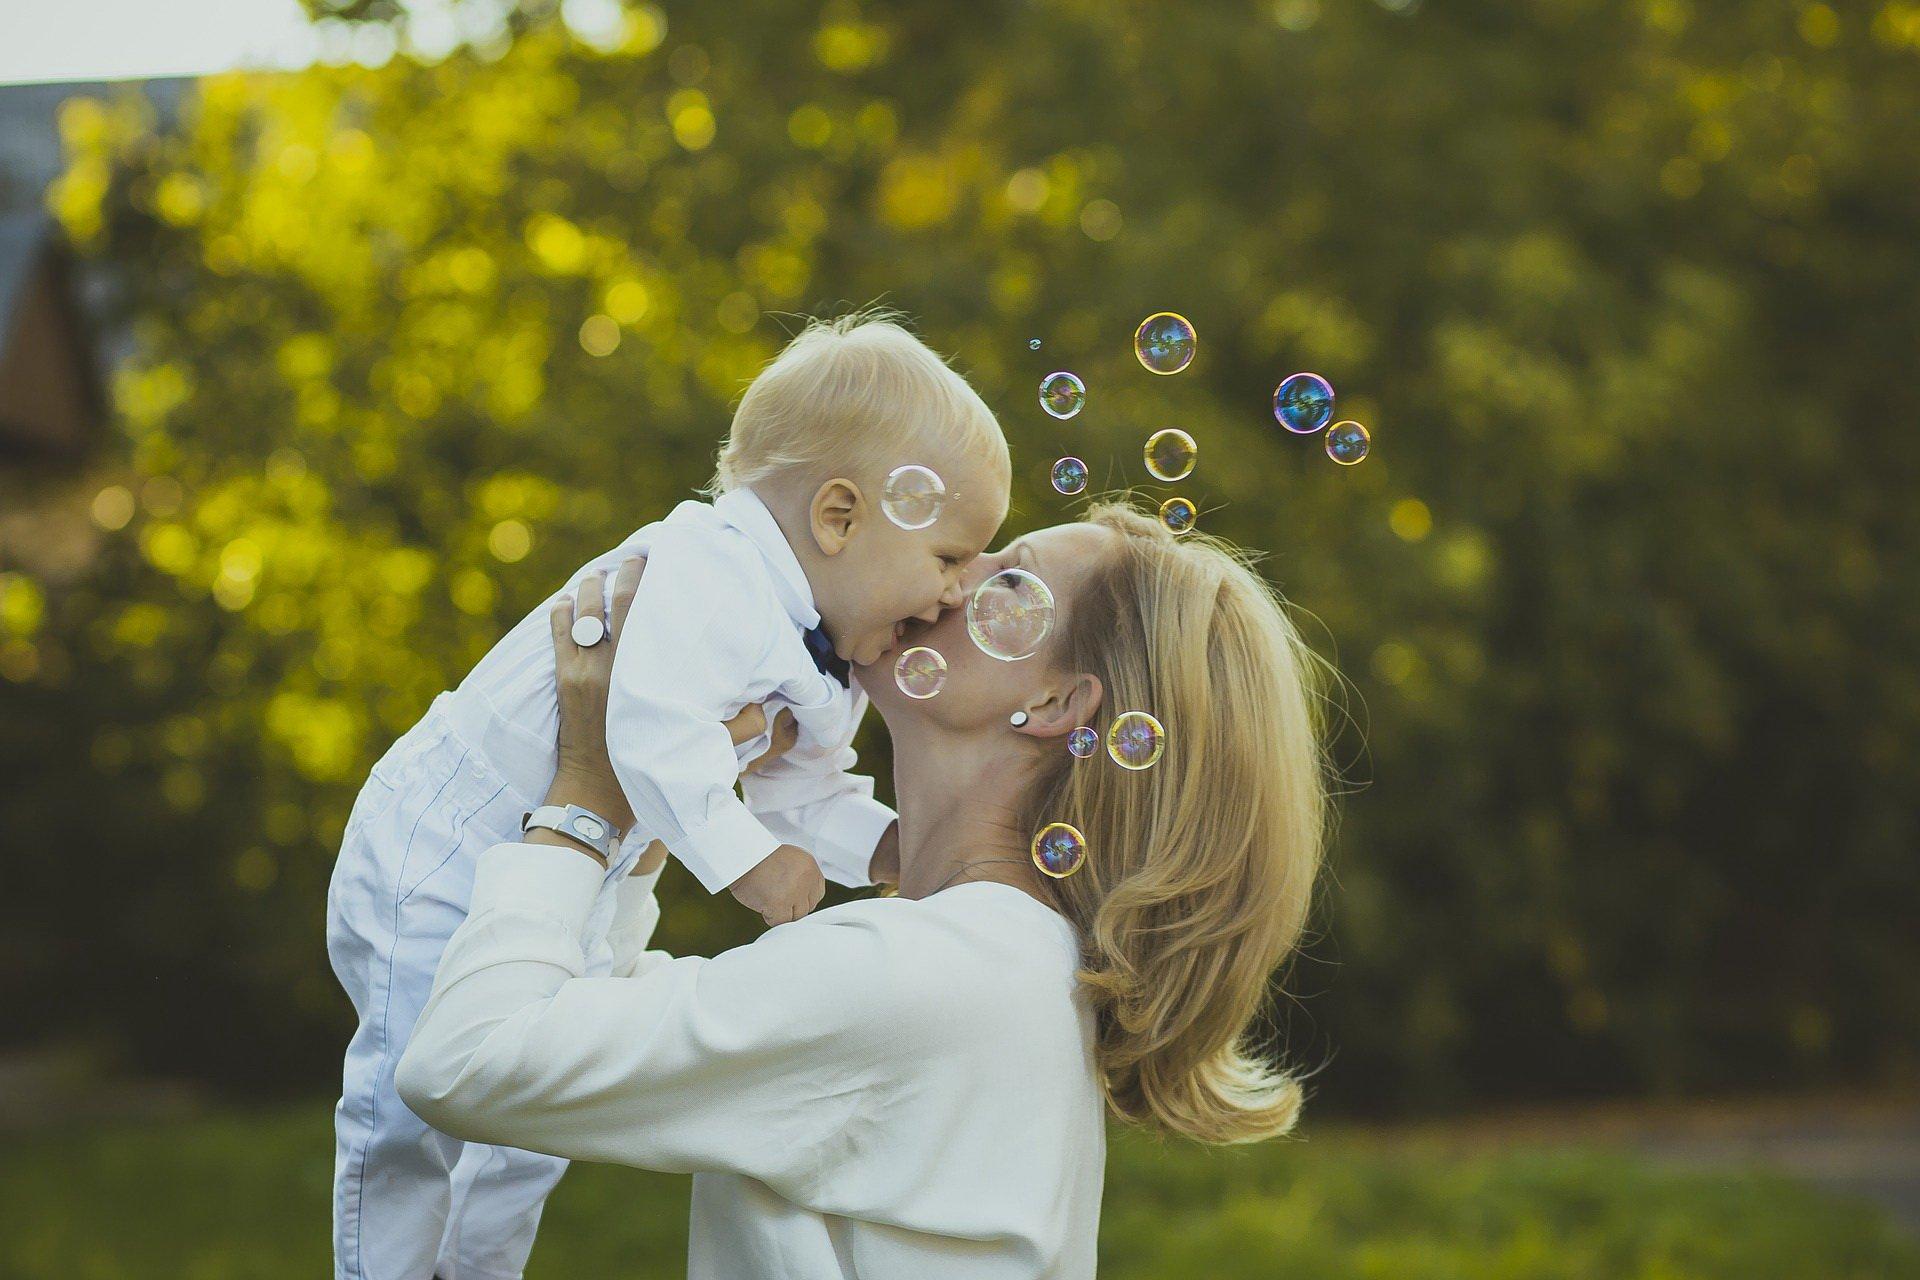 Bliskość matki i dziecka